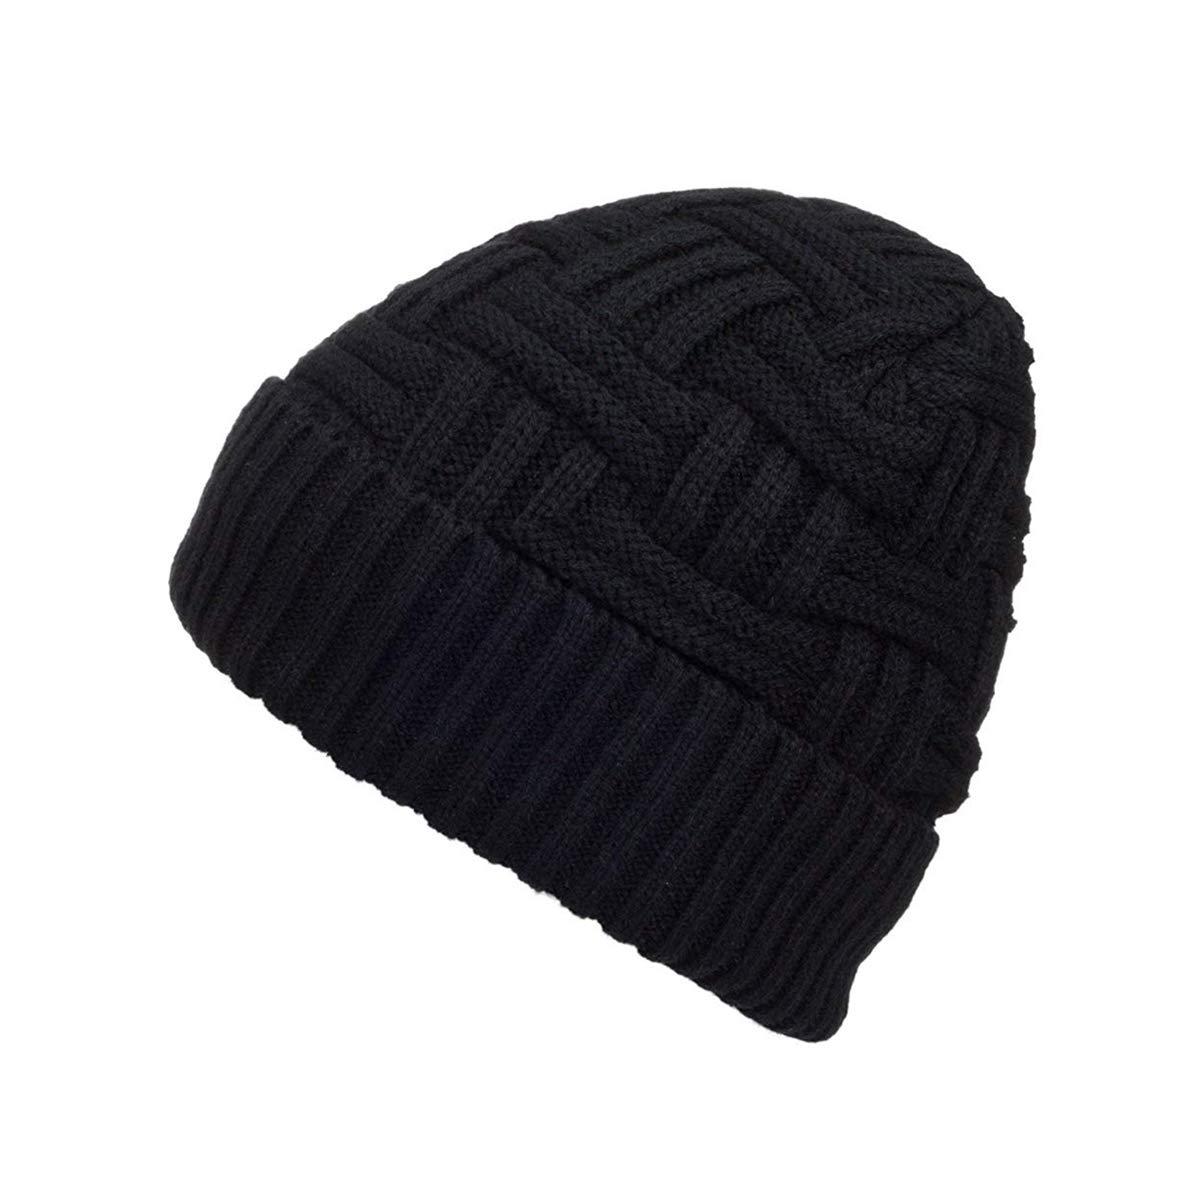 American Trends HAT メンズ B07G78XFBY One Size|Classic Black a Classic Black a One Size